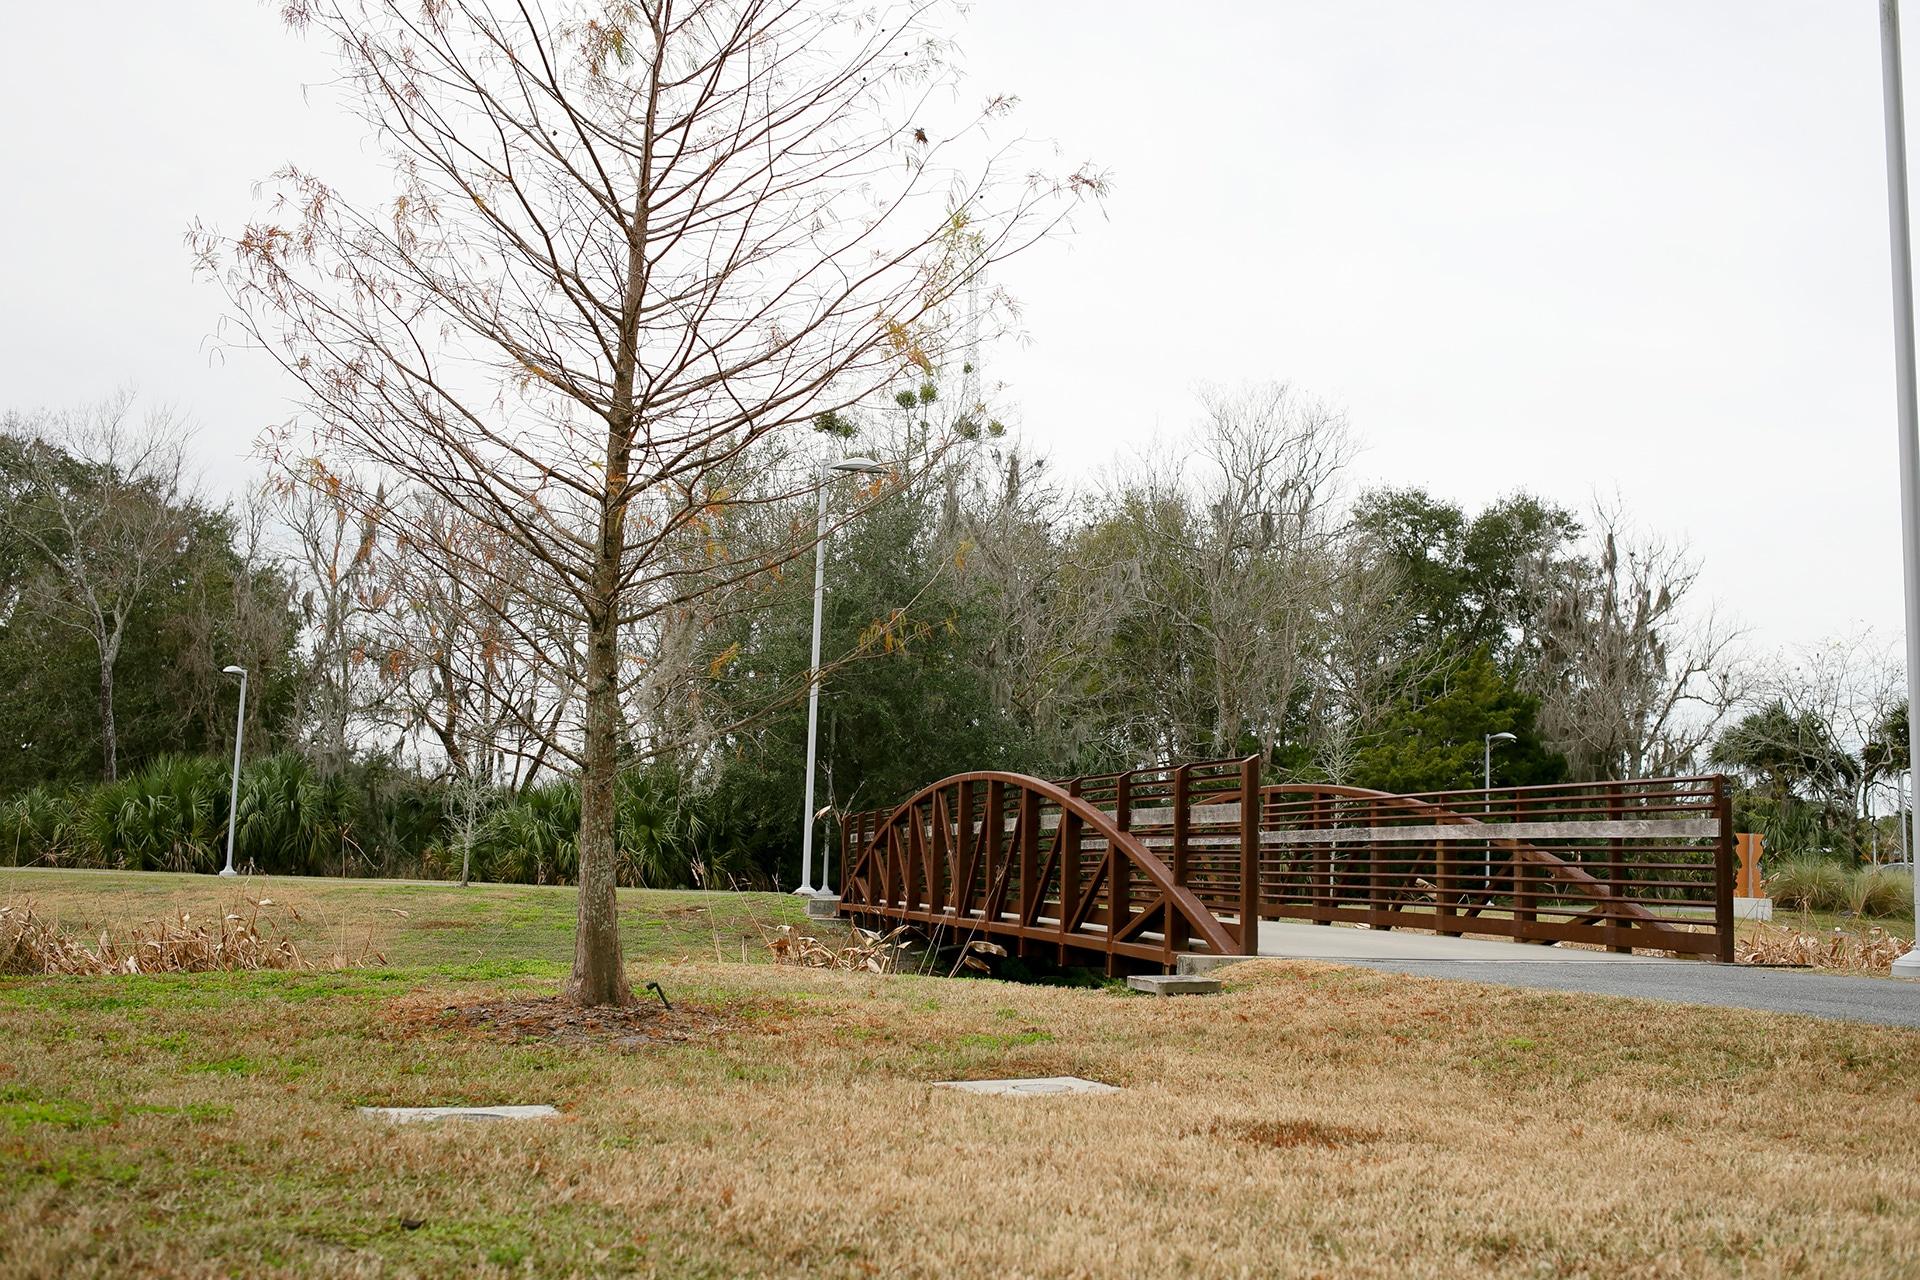 Depot Park bridge over a pond